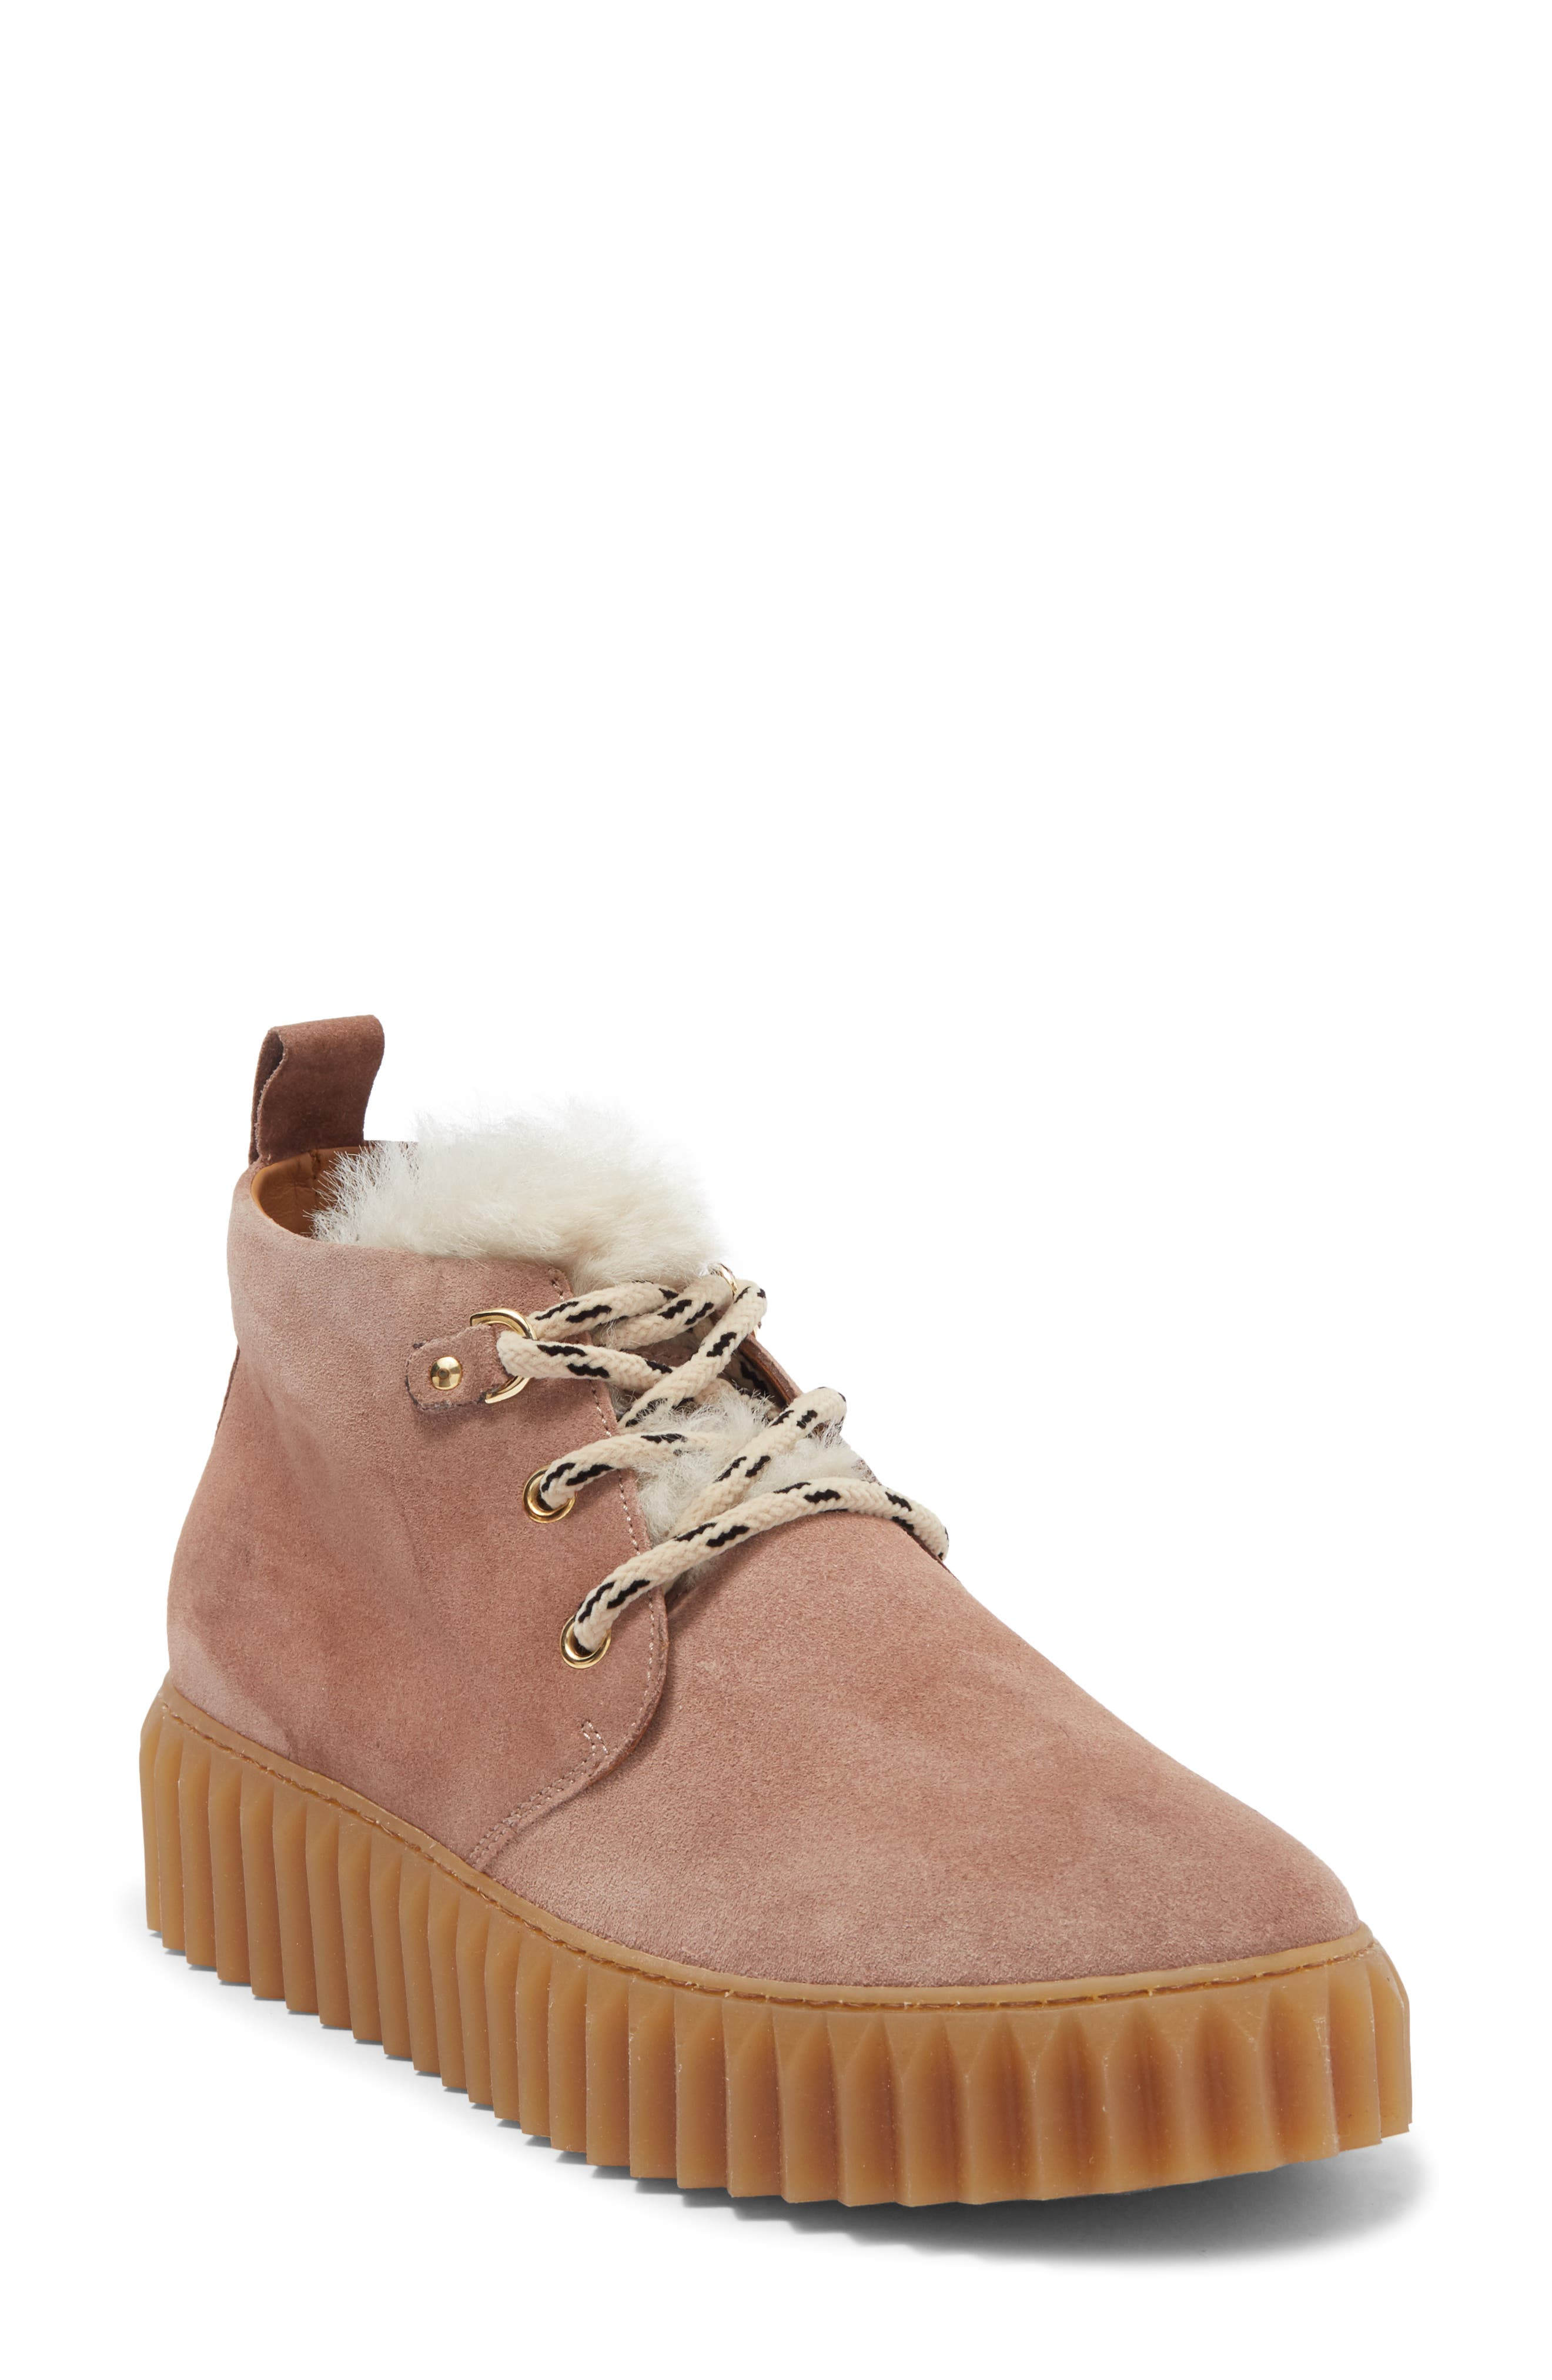 Image of Viola Blanche Egle Faux Fur Trim Platform High Top Sneaker